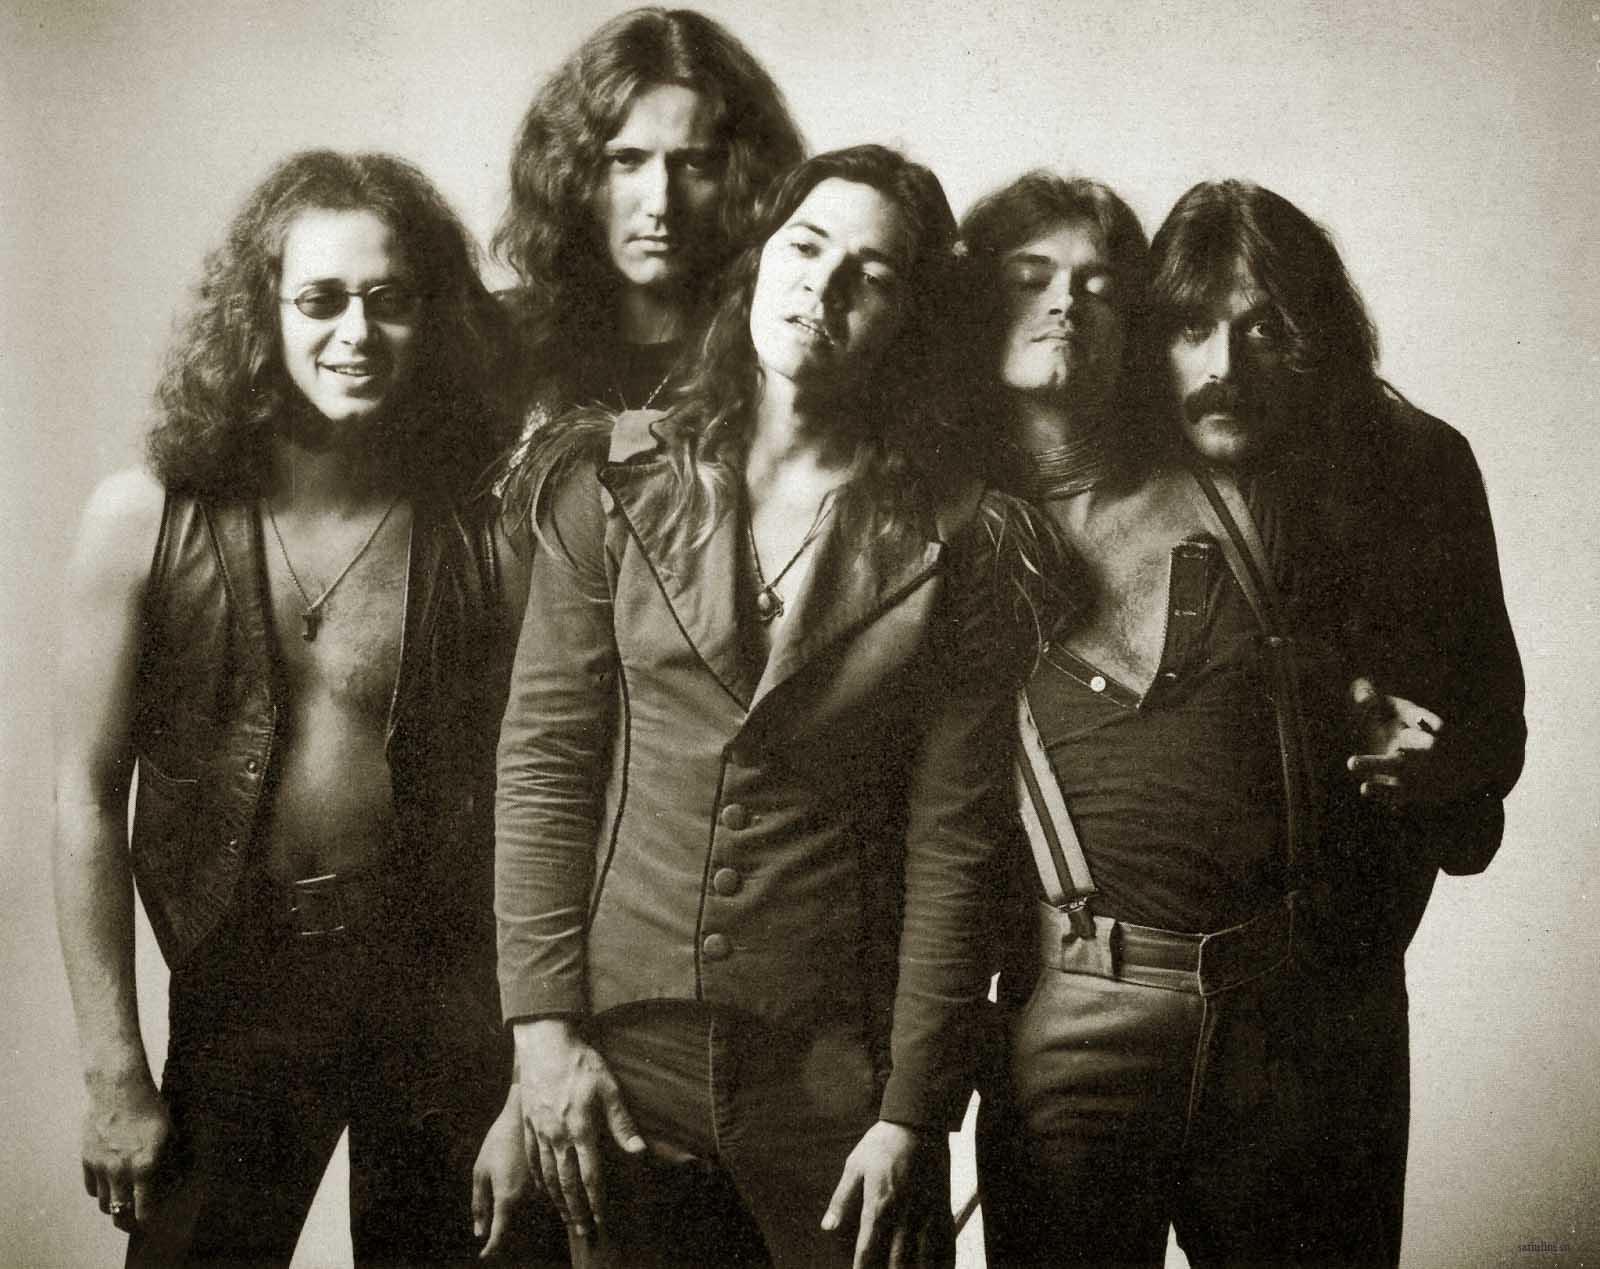 Whitesnake Deep Purple David Coverdale обзор альбома Альберт Сафиуллин